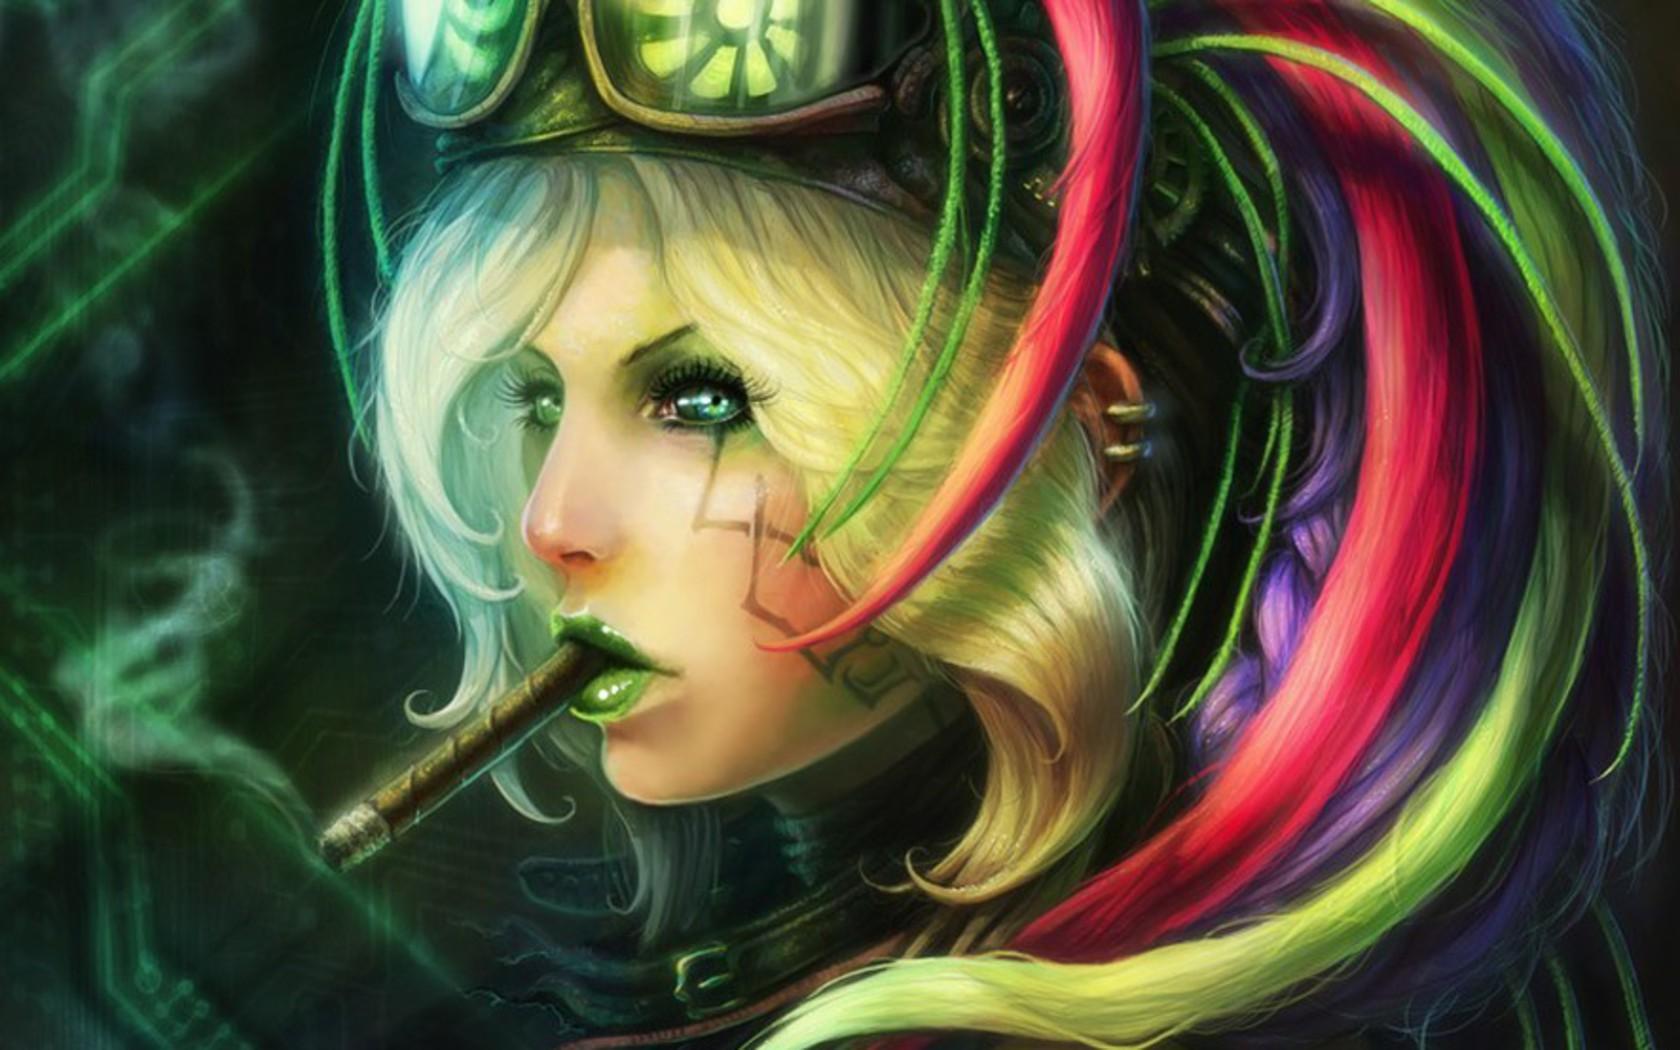 Cybernetic Girls Hd Wallpaper Steampunk Fond D 233 Cran And Arri 232 Re Plan 1680x1050 Id